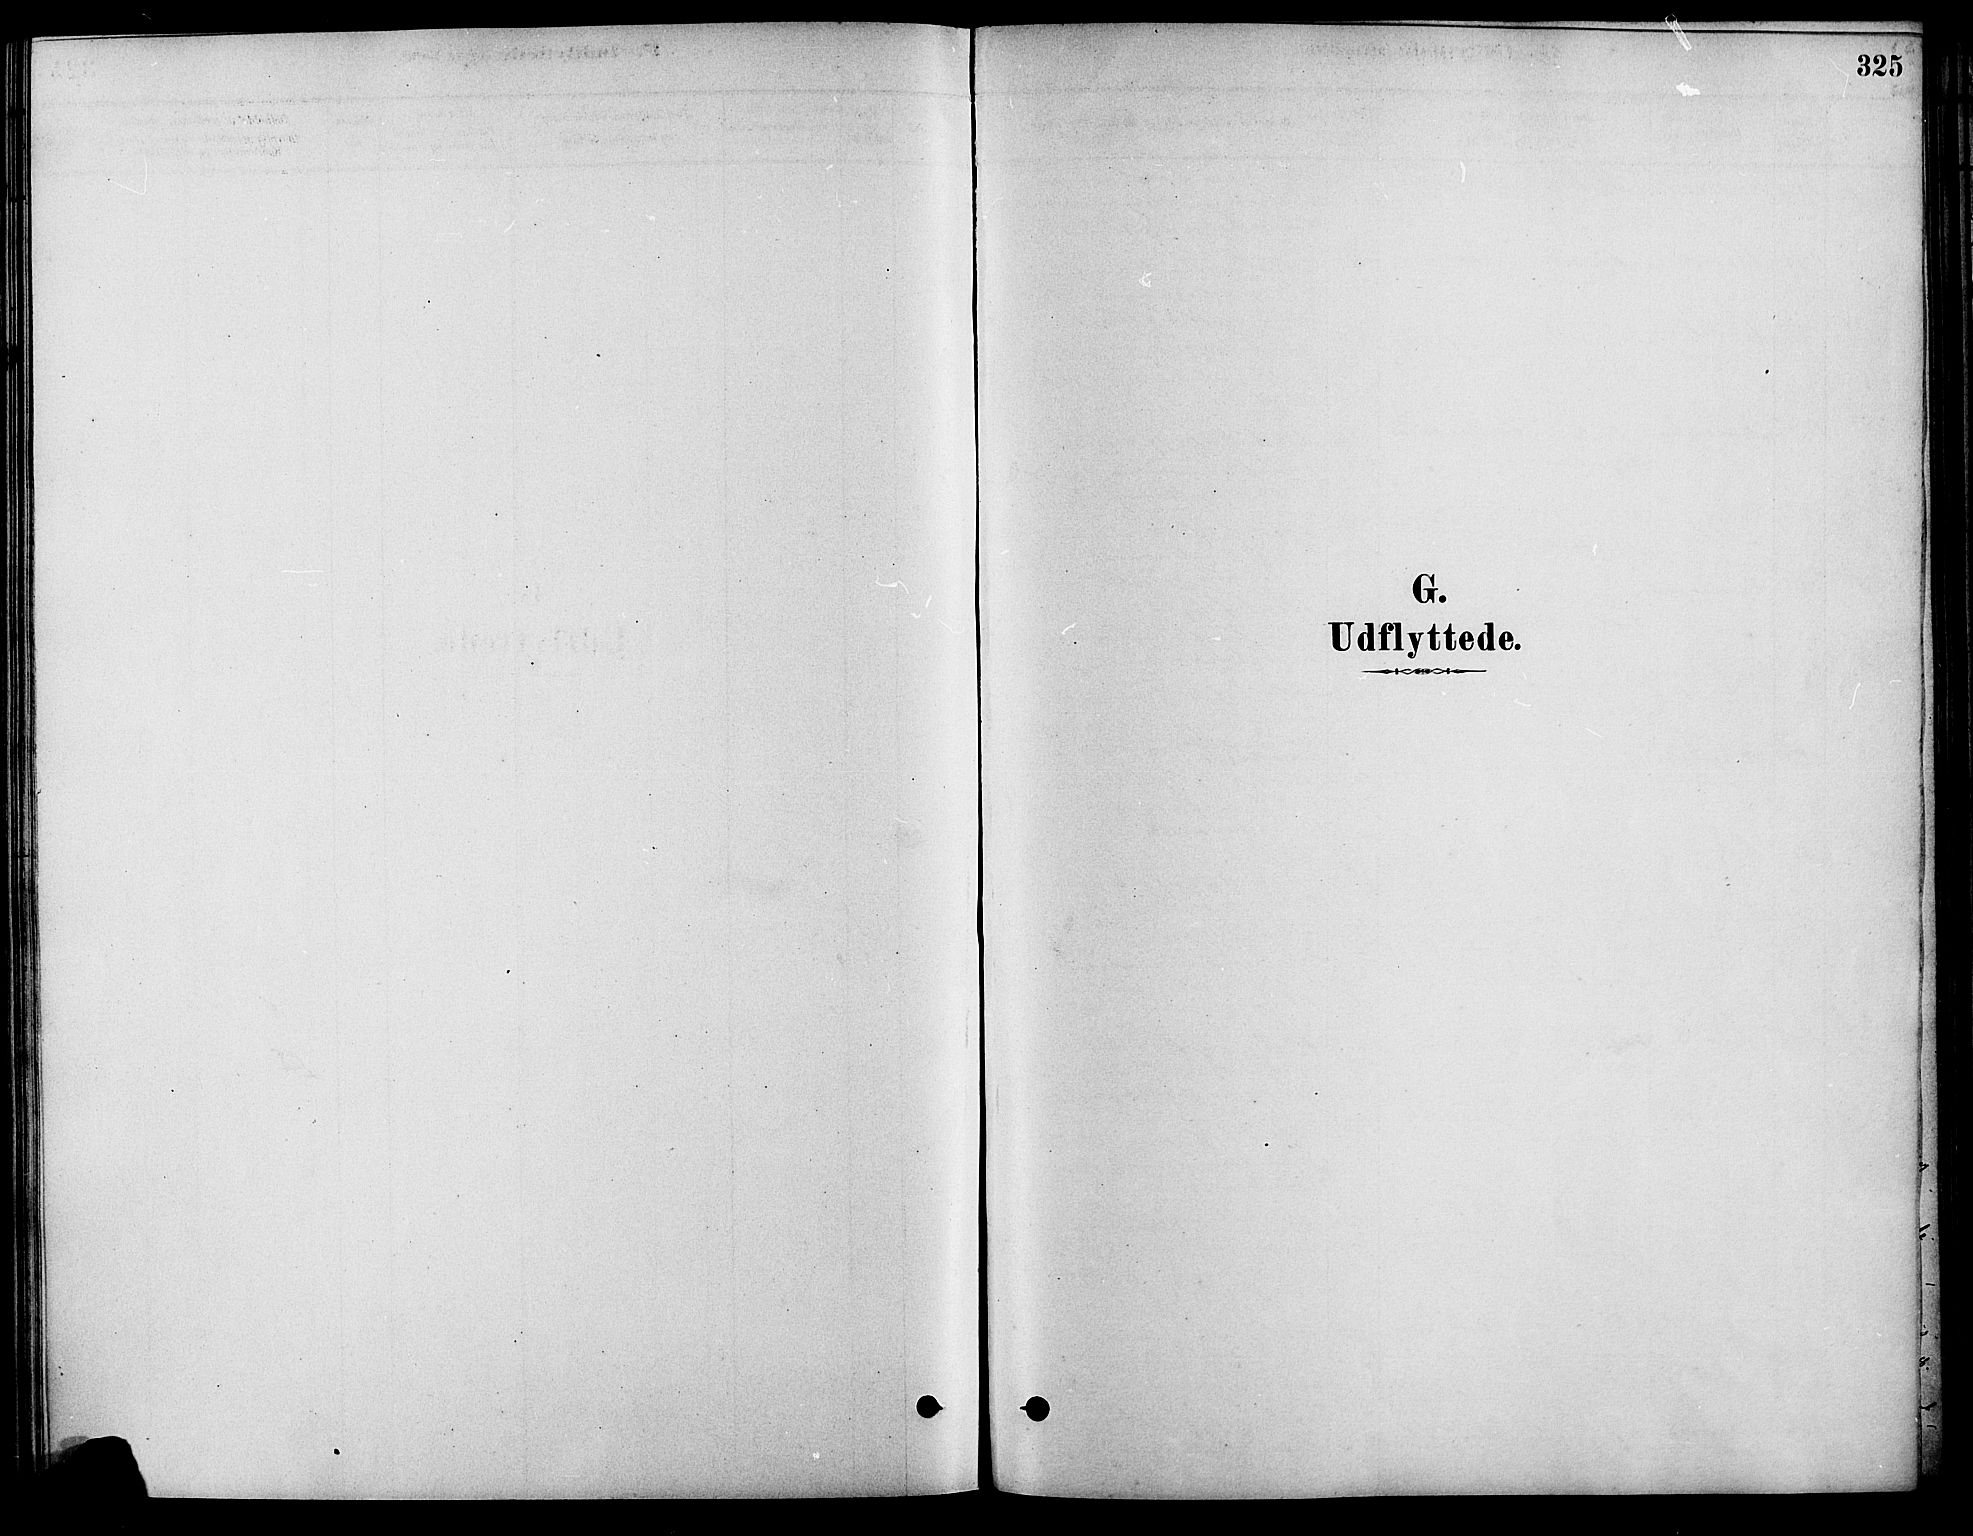 SAH, Fåberg prestekontor, Ministerialbok nr. 8, 1879-1898, s. 325